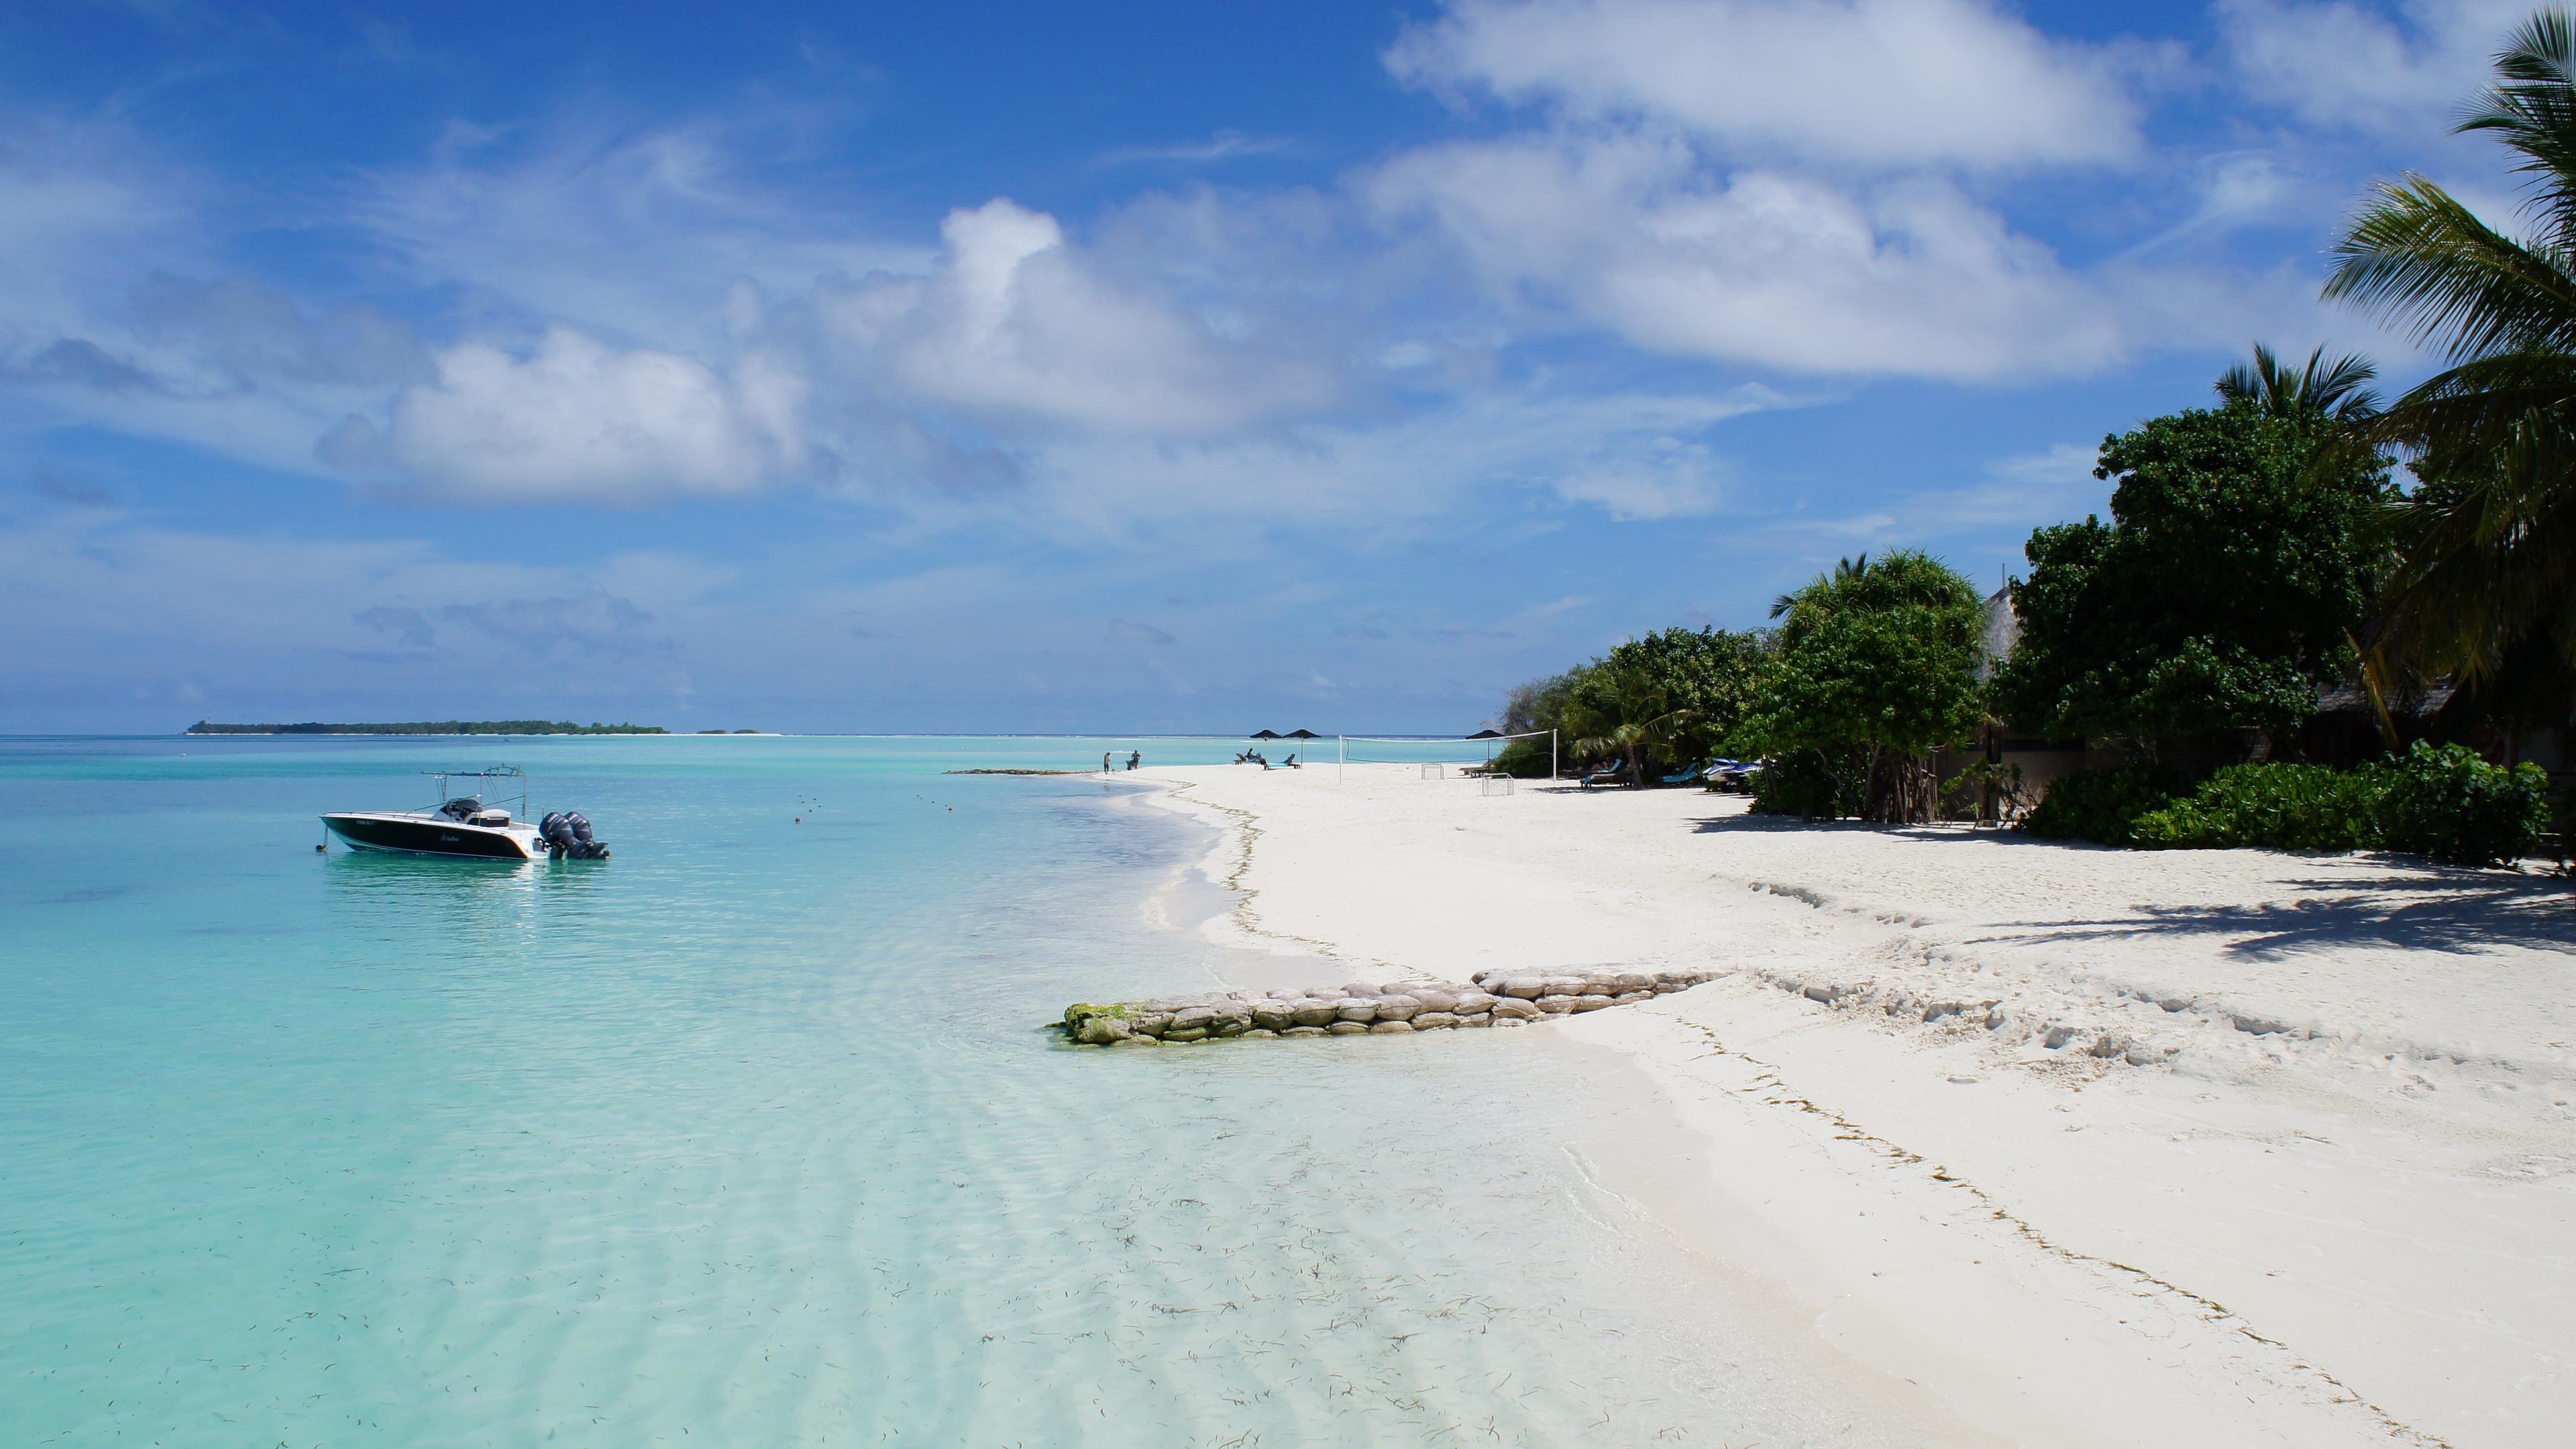 maldives tropical beach shore 4k 1541117895 - maldives, tropical, beach, shore 4k - Tropical, Maldives, Beach